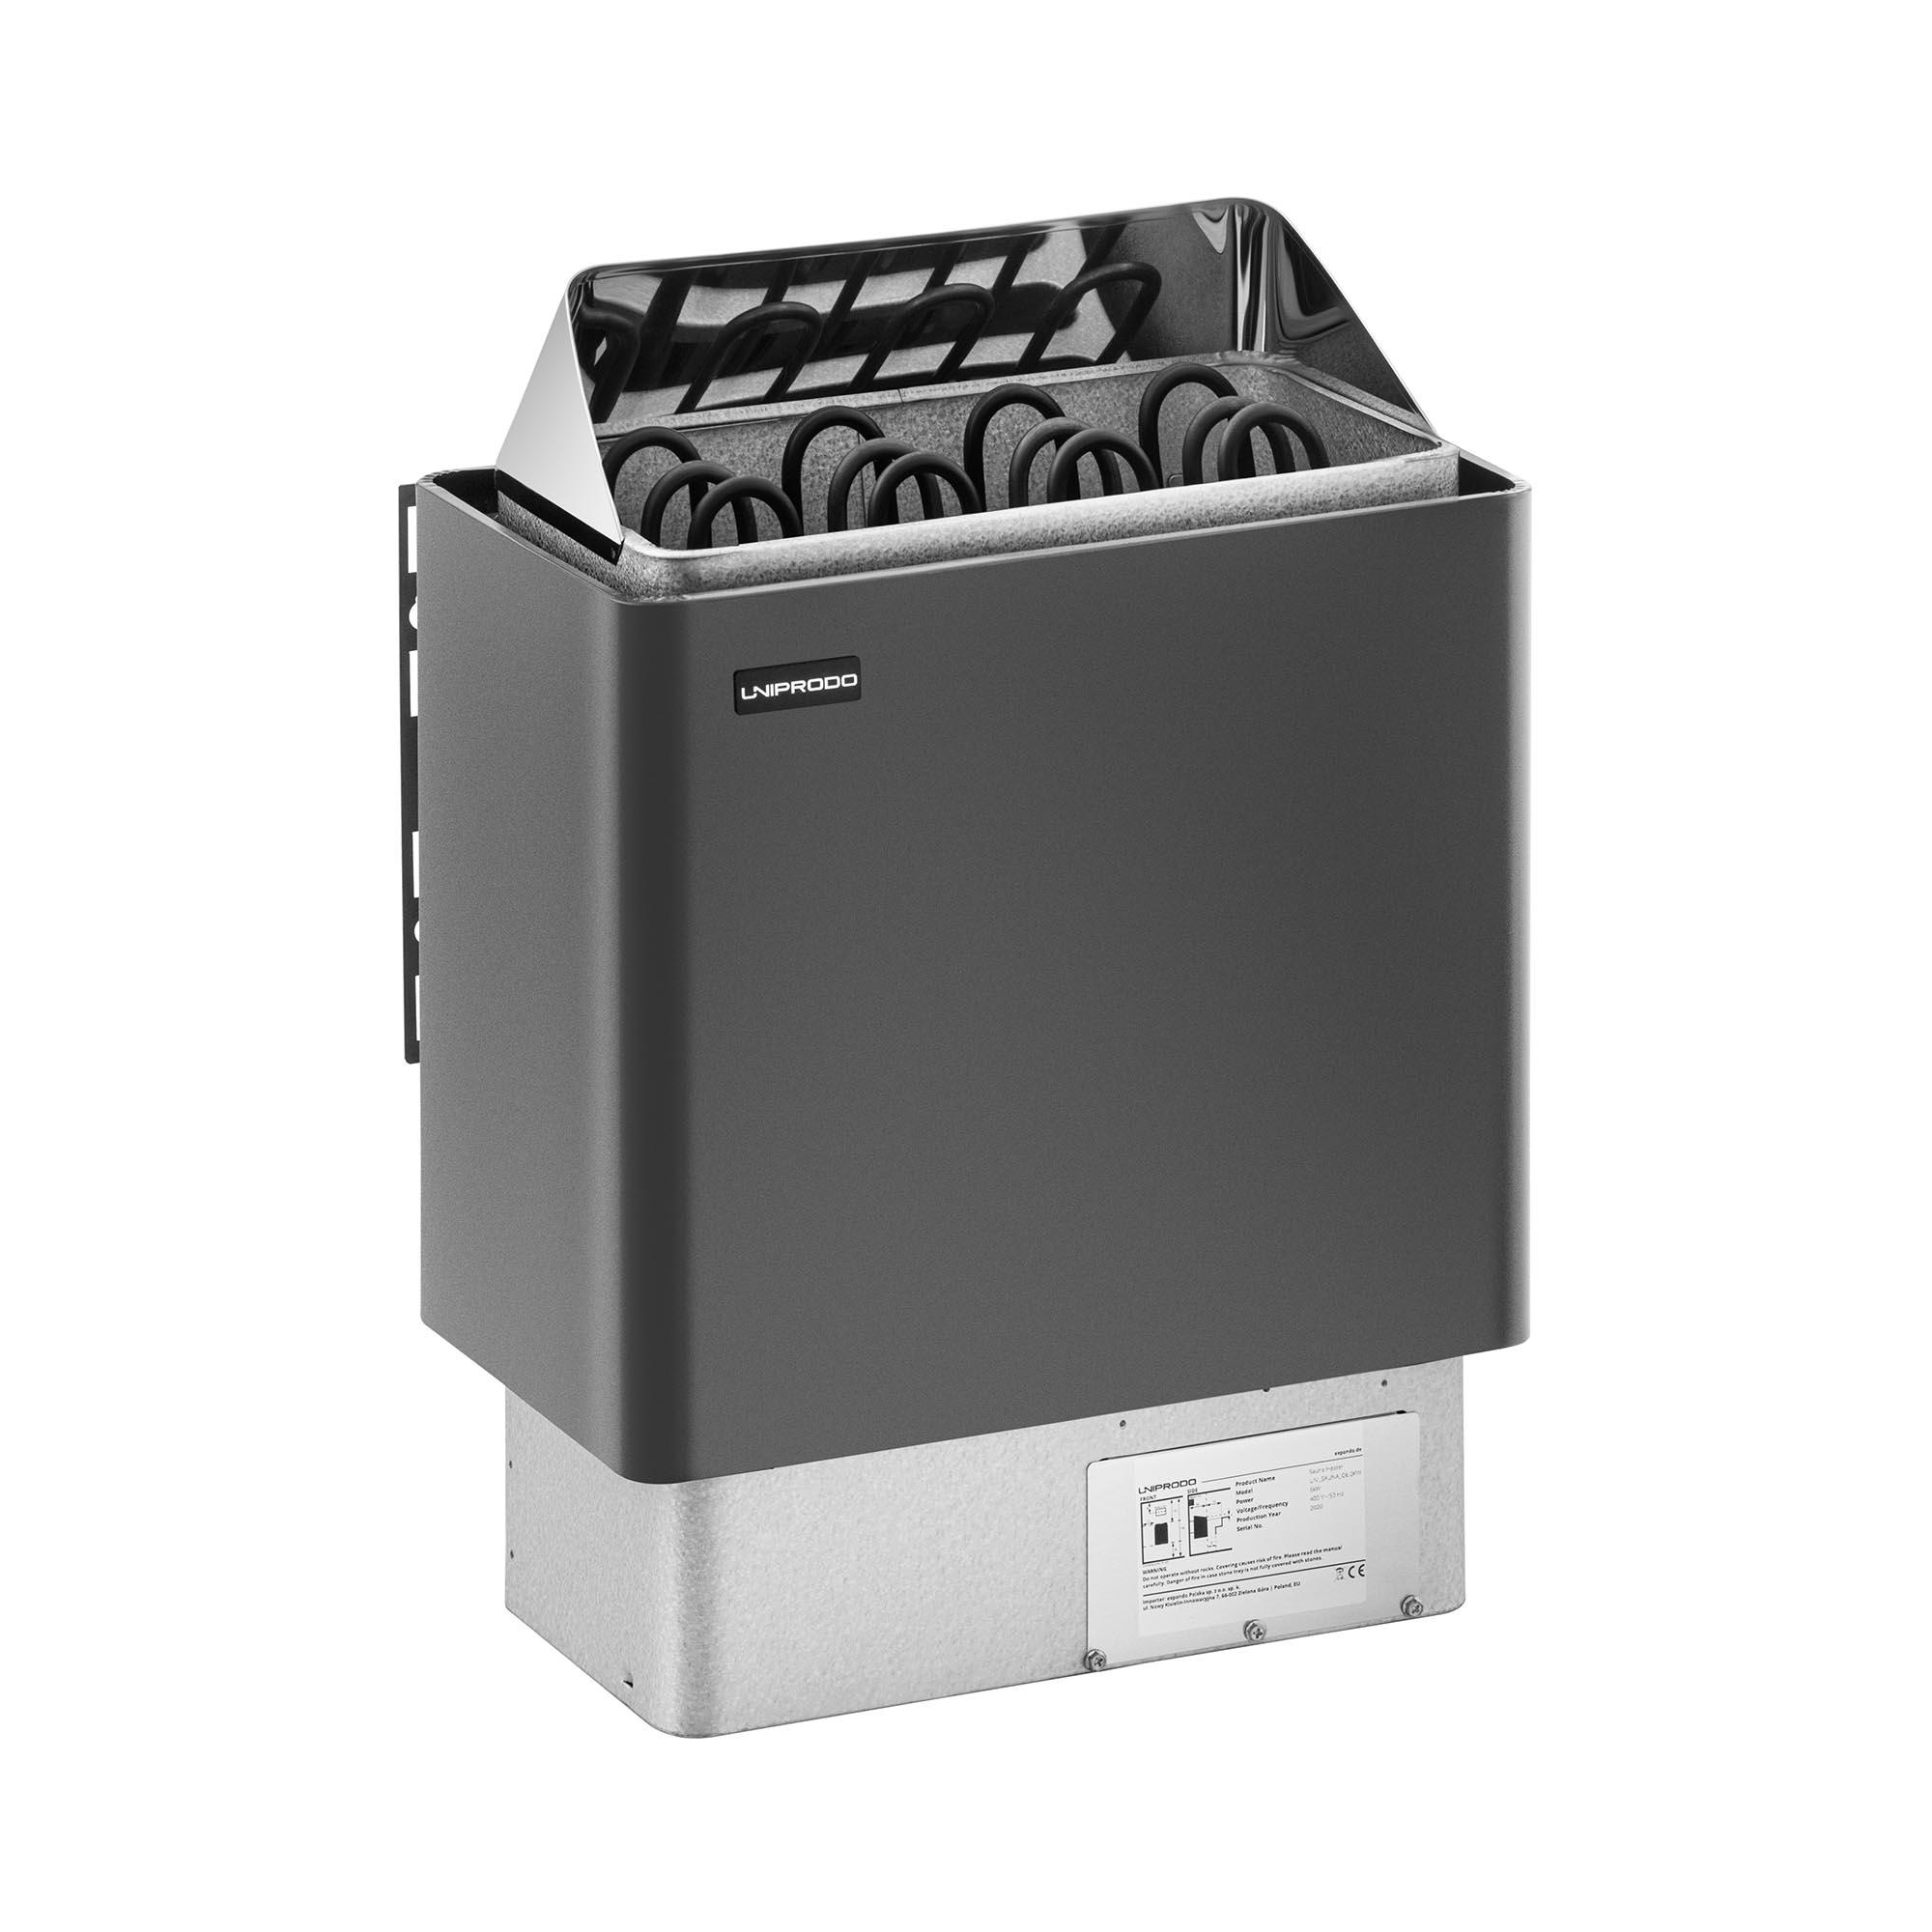 Uniprodo Poêle pour sauna - 6 kW - 30 à 110 °C UNI_SAUNA_G6.0KW